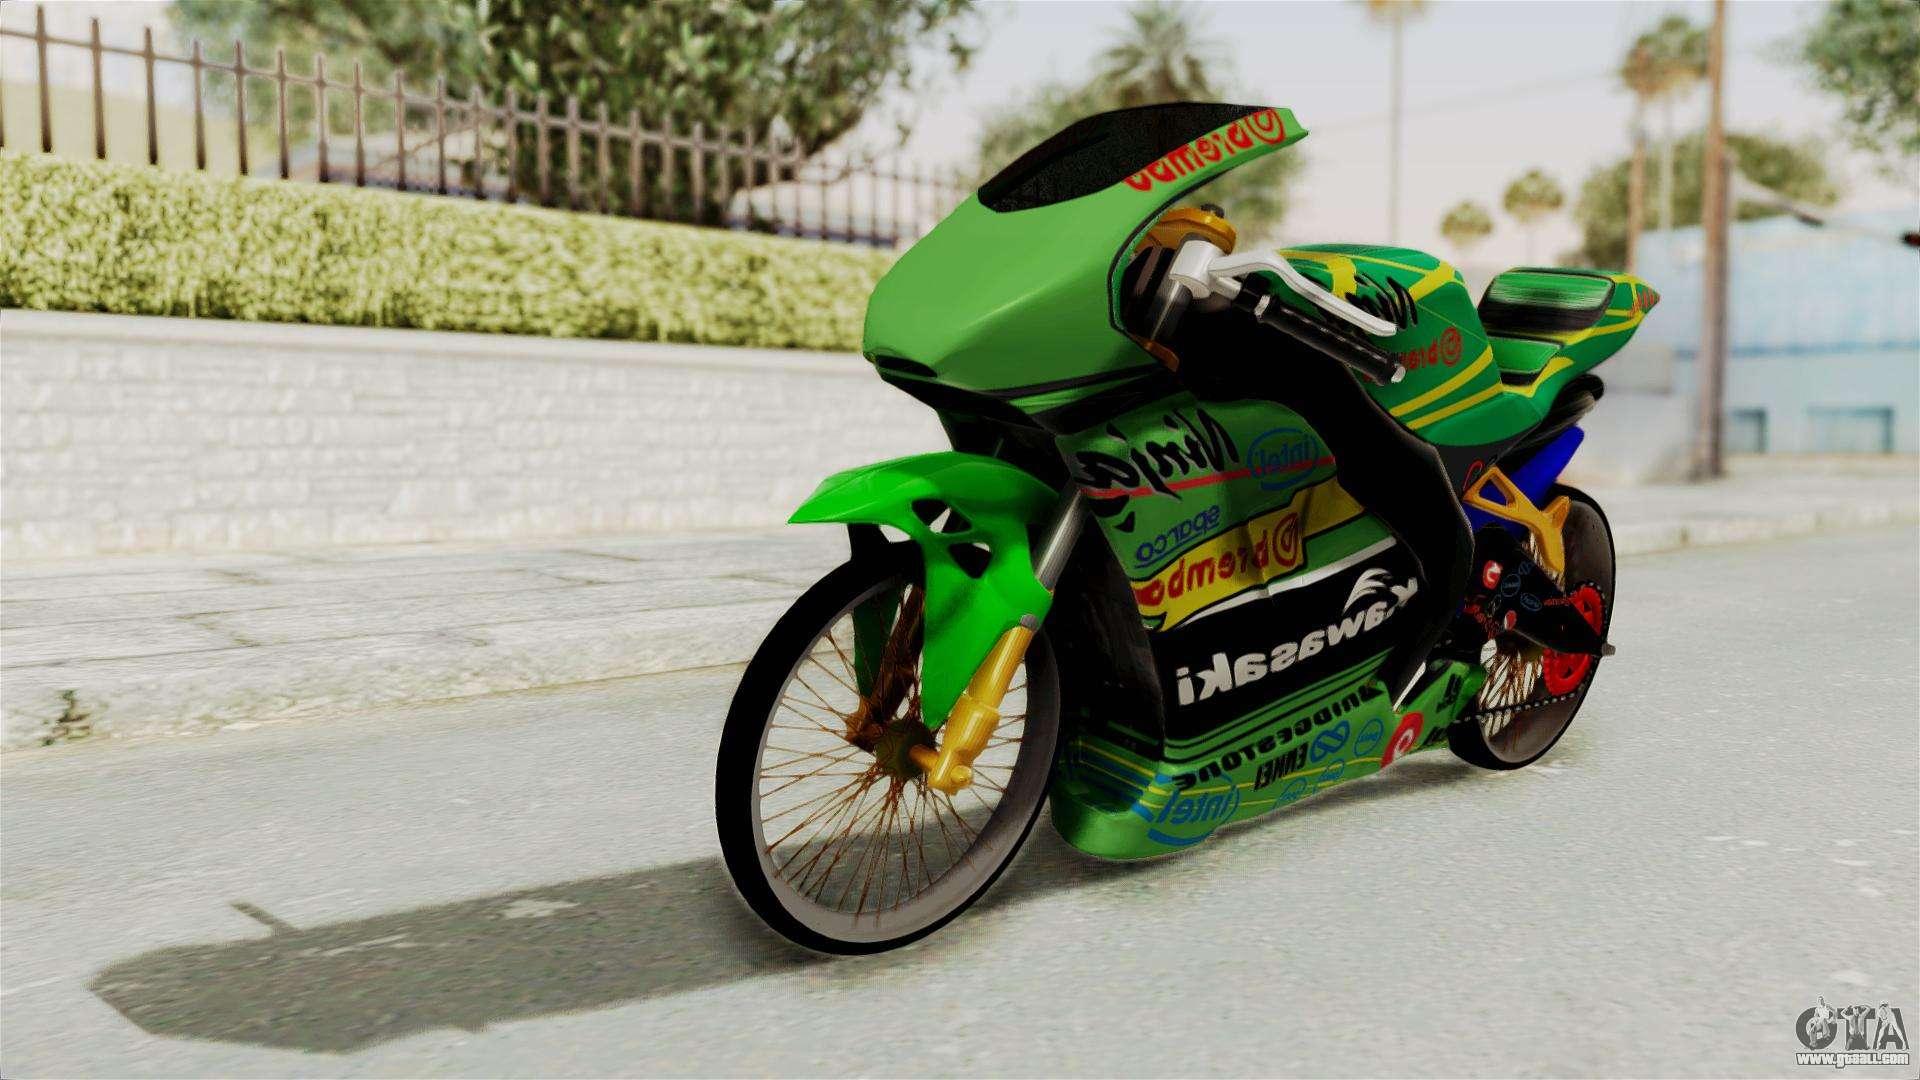 Ninja 250 Modif Touring - Pecinta Dunia Otomotif